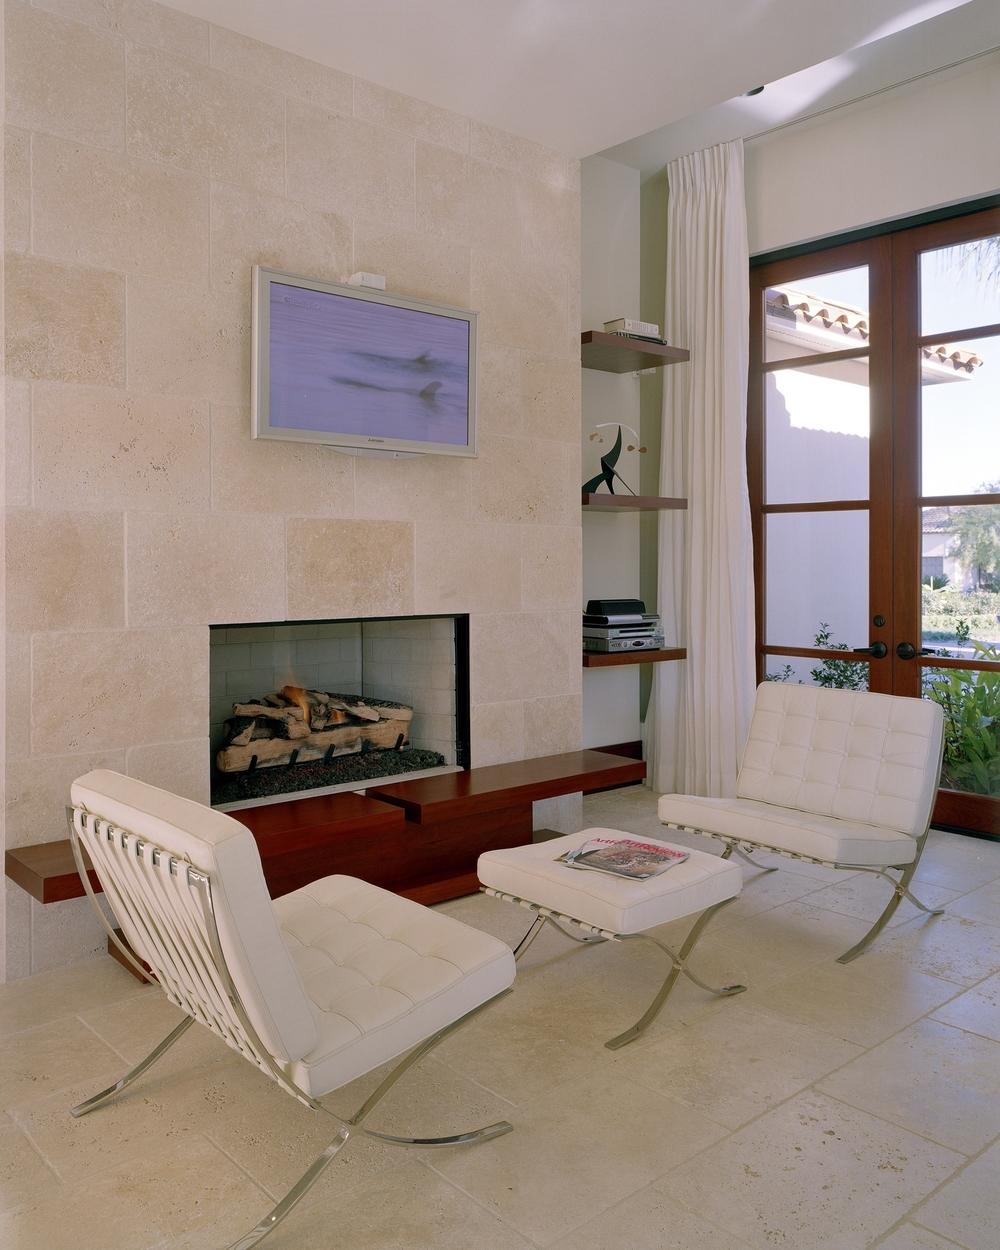 Rogillio Residence 158 copy.jpg